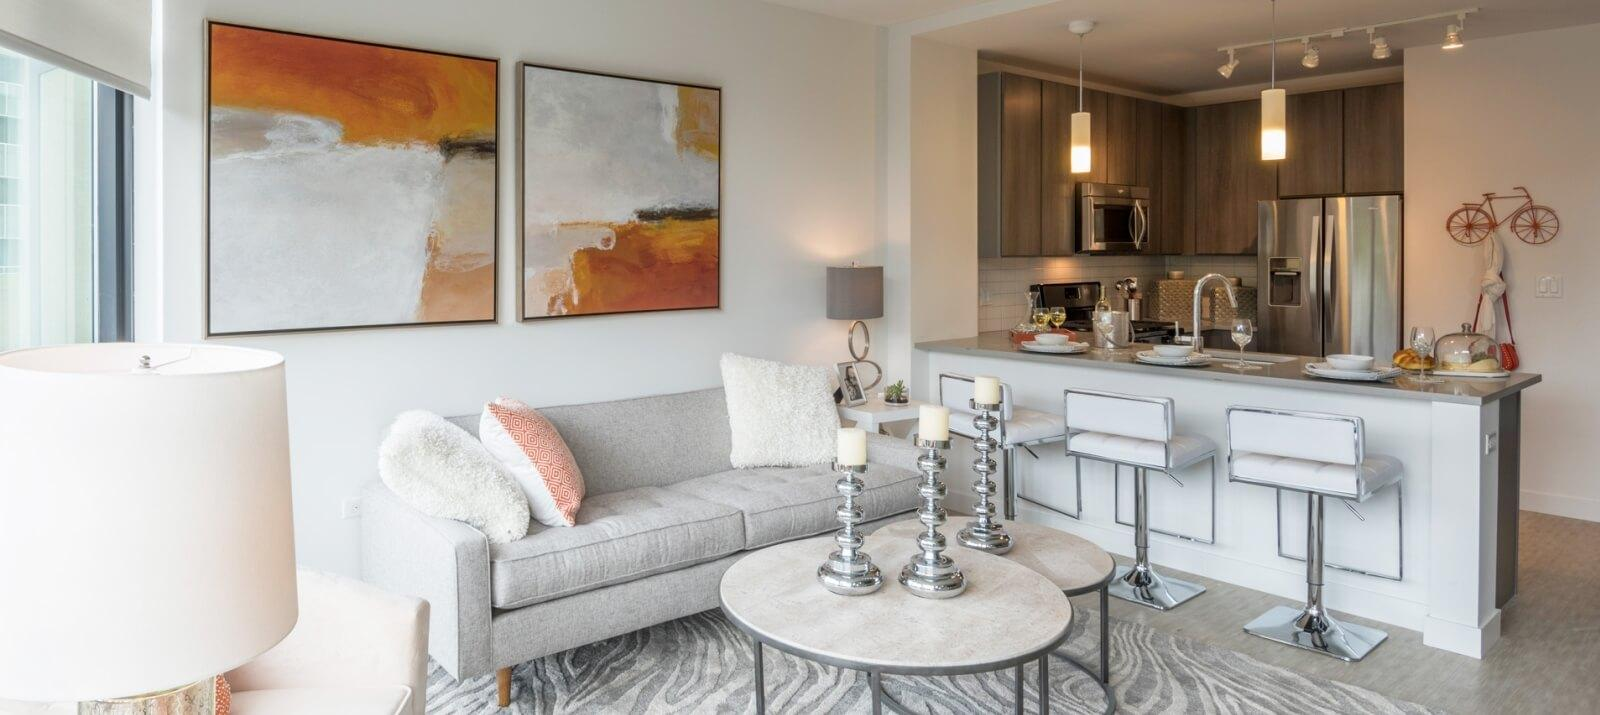 reversible apartment upgrades